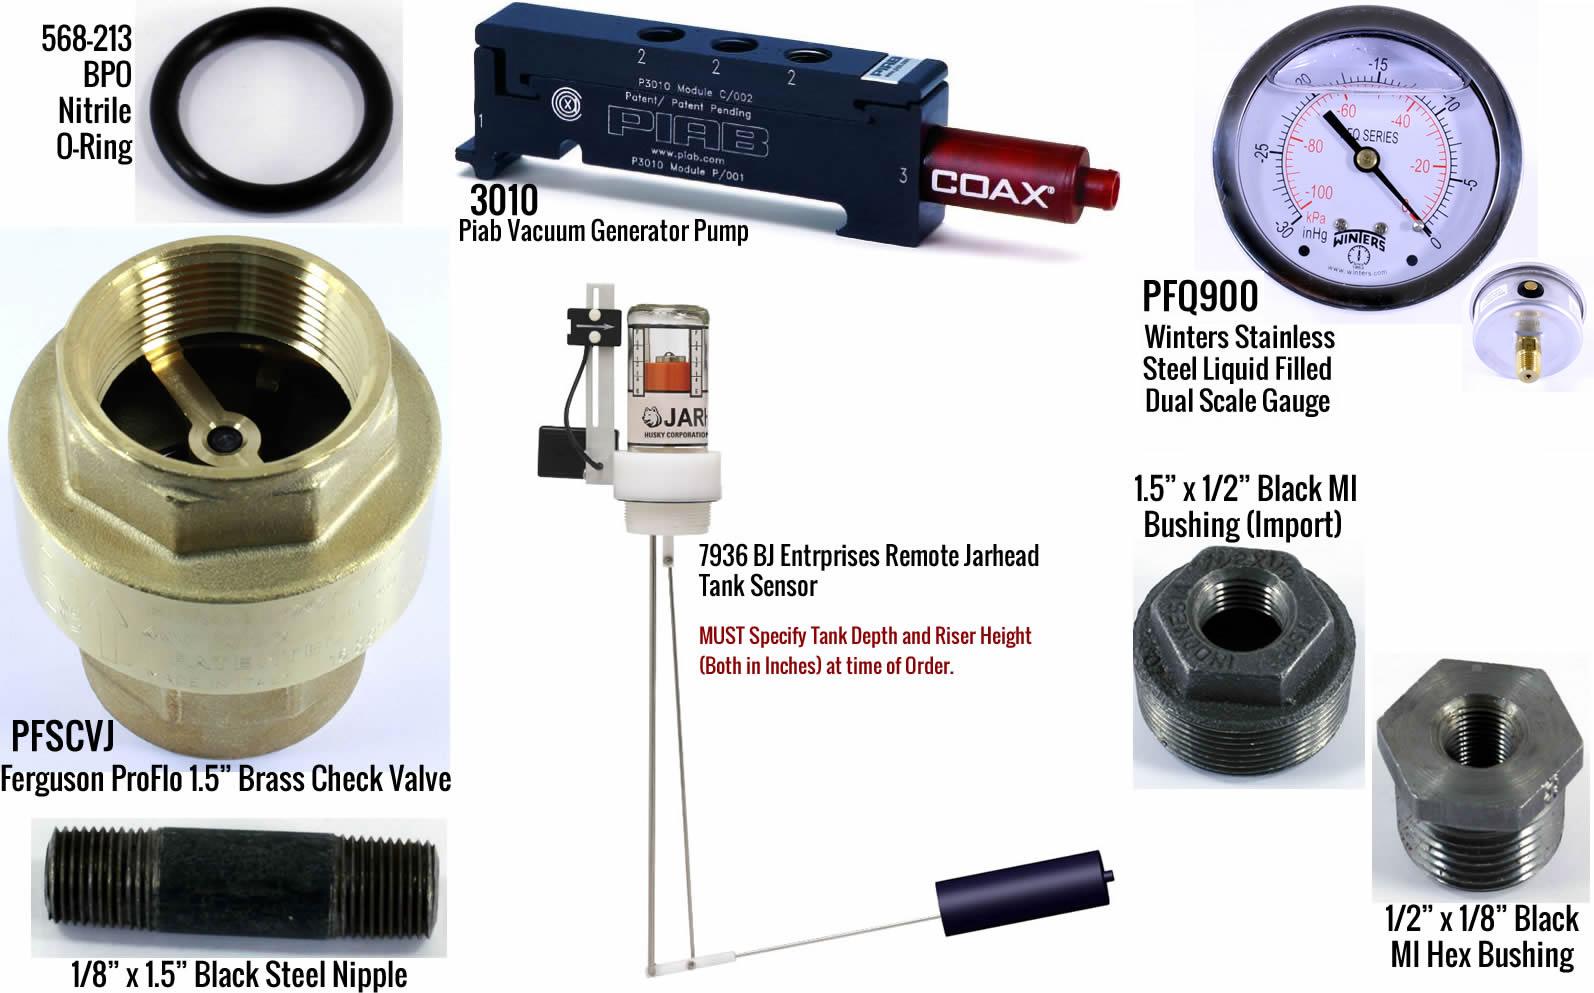 MYERSVT-KIT Myers Tank Vacuum Test Kit w/ - (1) P3010.01.AE.02.AA.00 Piab 3010 Series Vacuum Generator Pump - (1) PFSCVJ Ferguson ProFlo 1.5